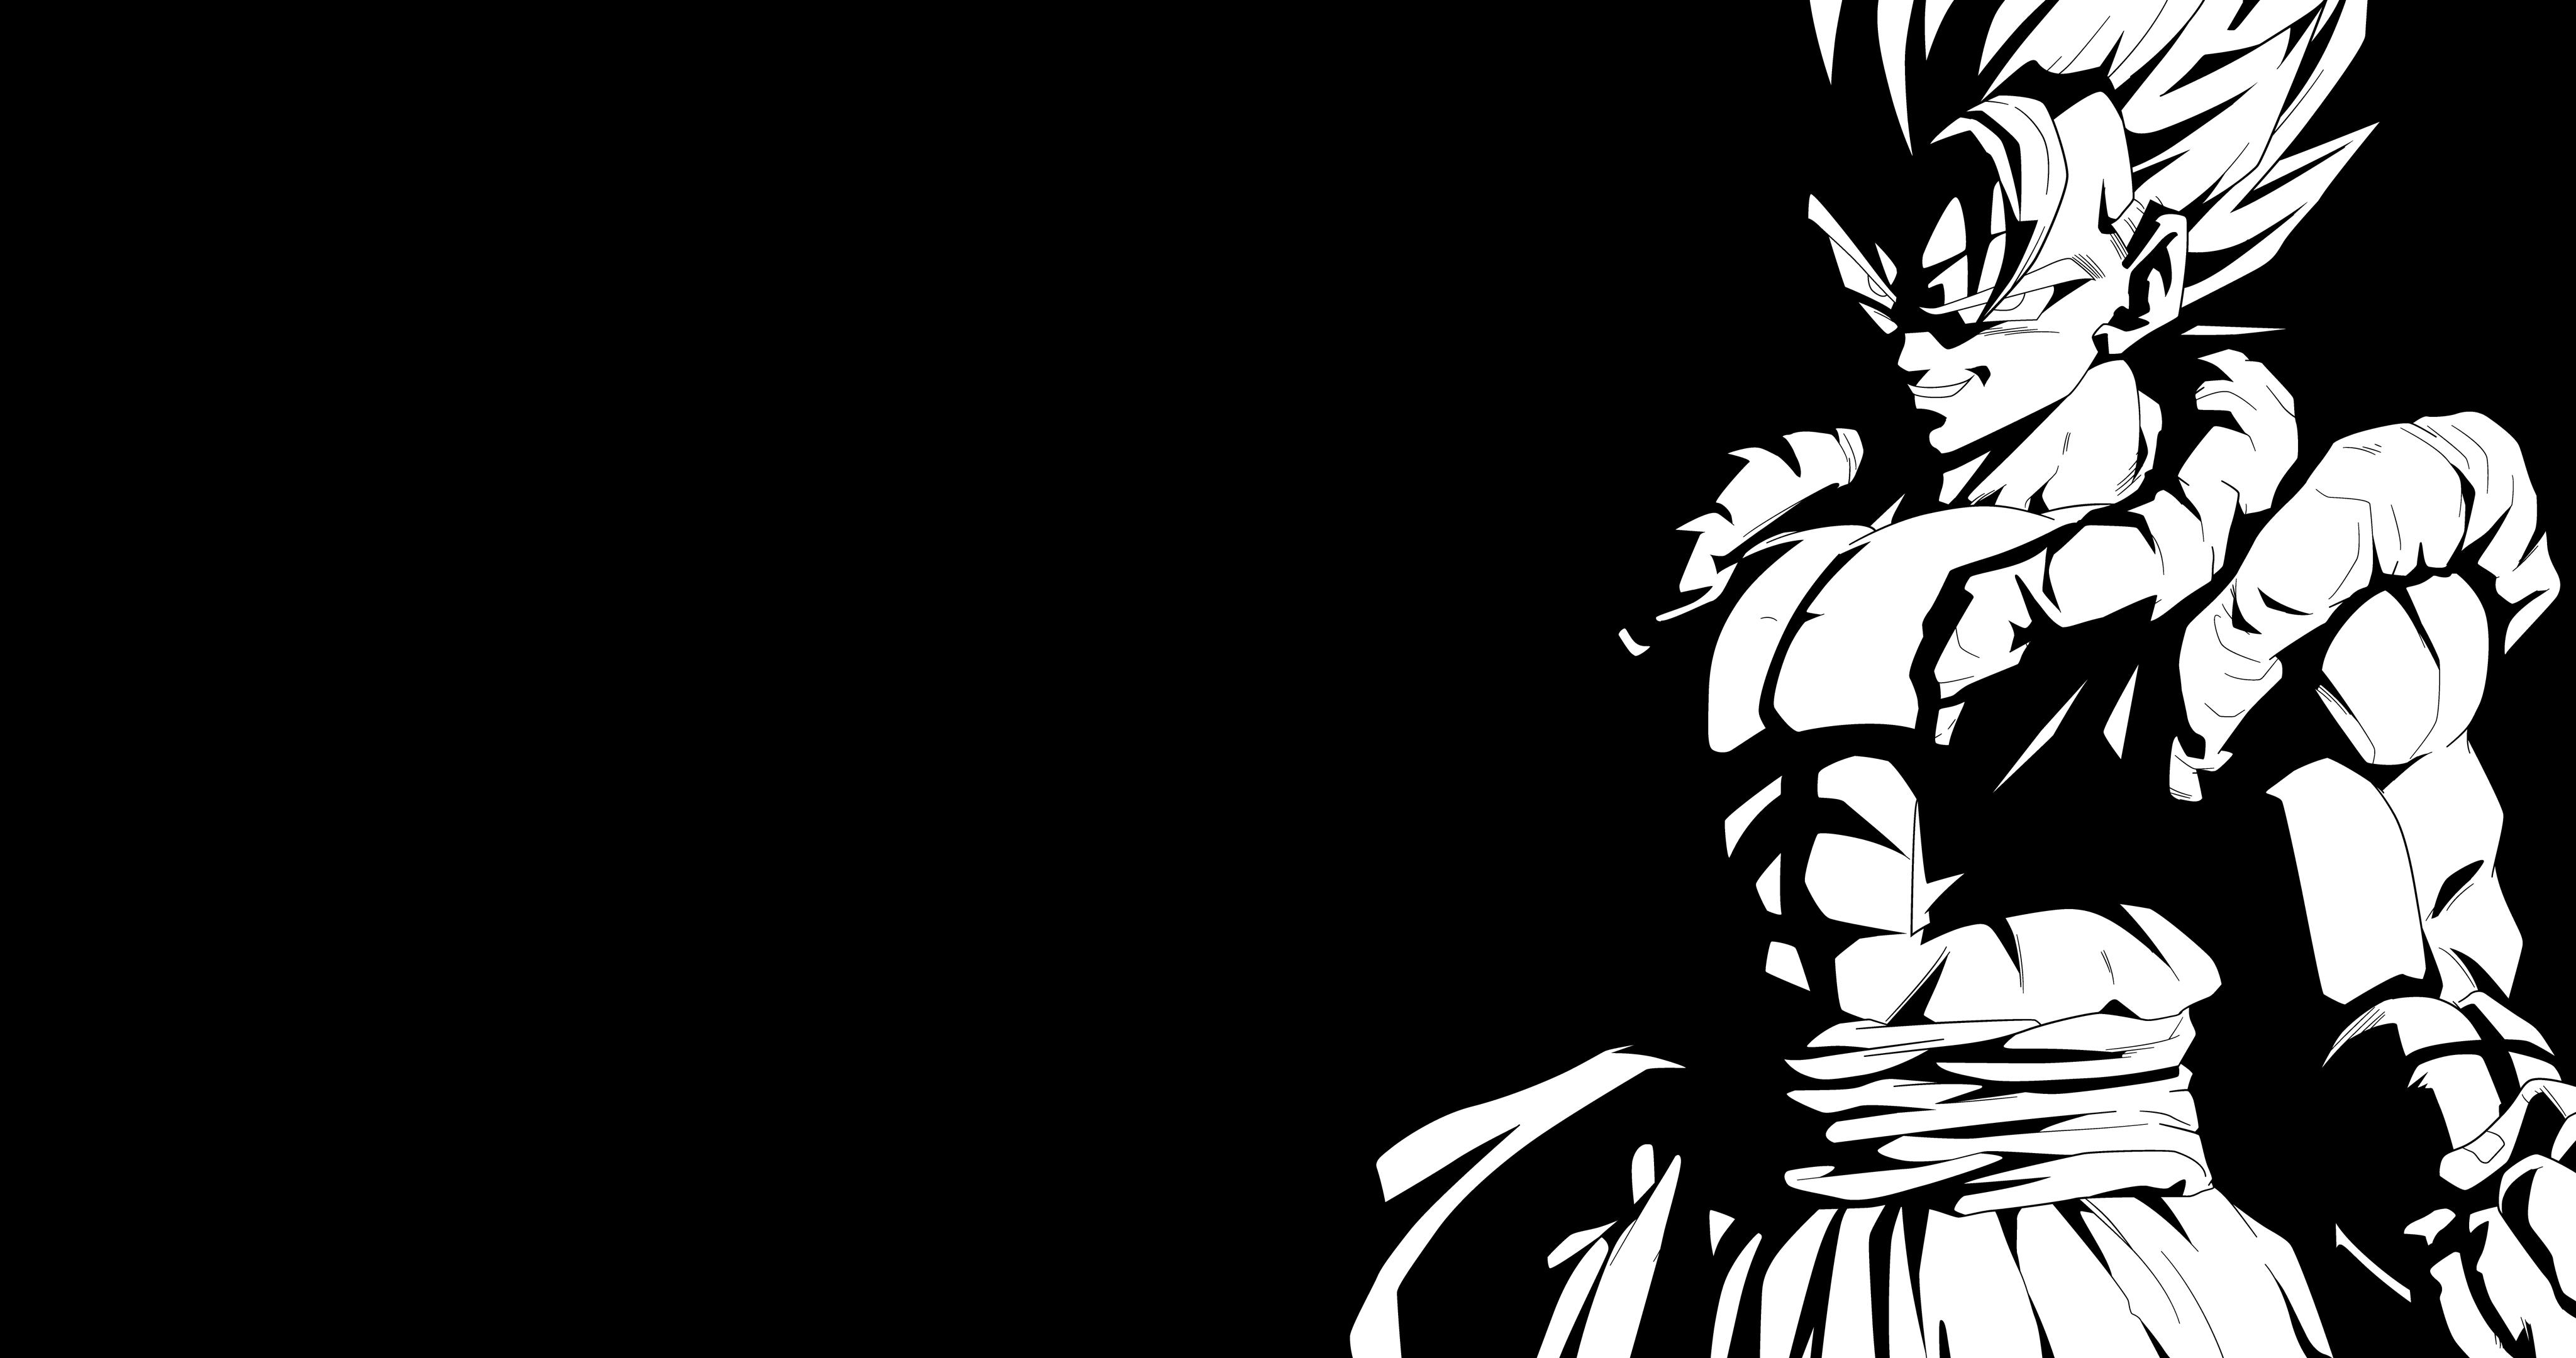 19 Dragon Ball Z Black And White Wallpapers On Wallpapersafari